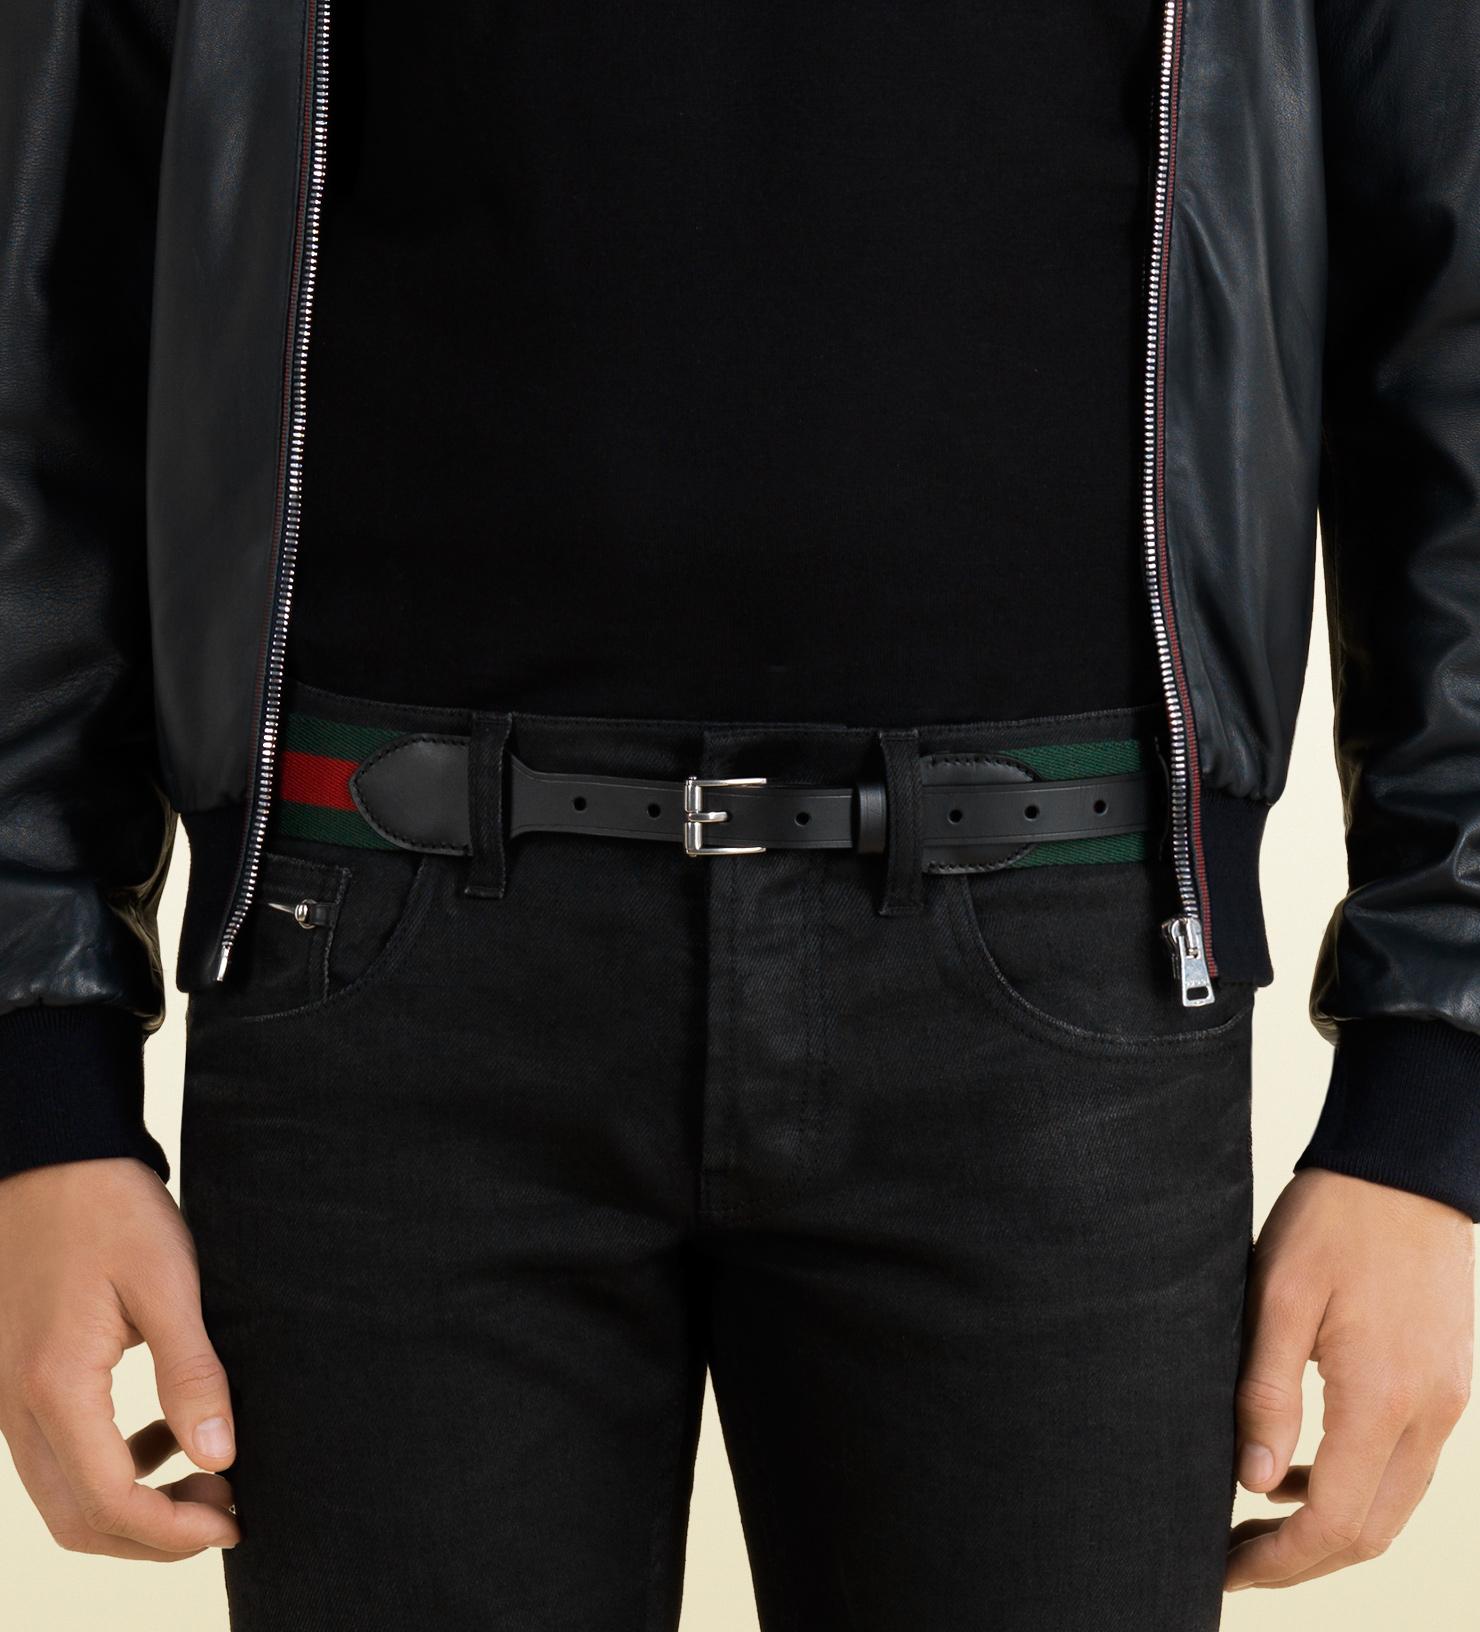 60f8d48f7ad Lyst - Gucci Signature Web Belt in Green for Men